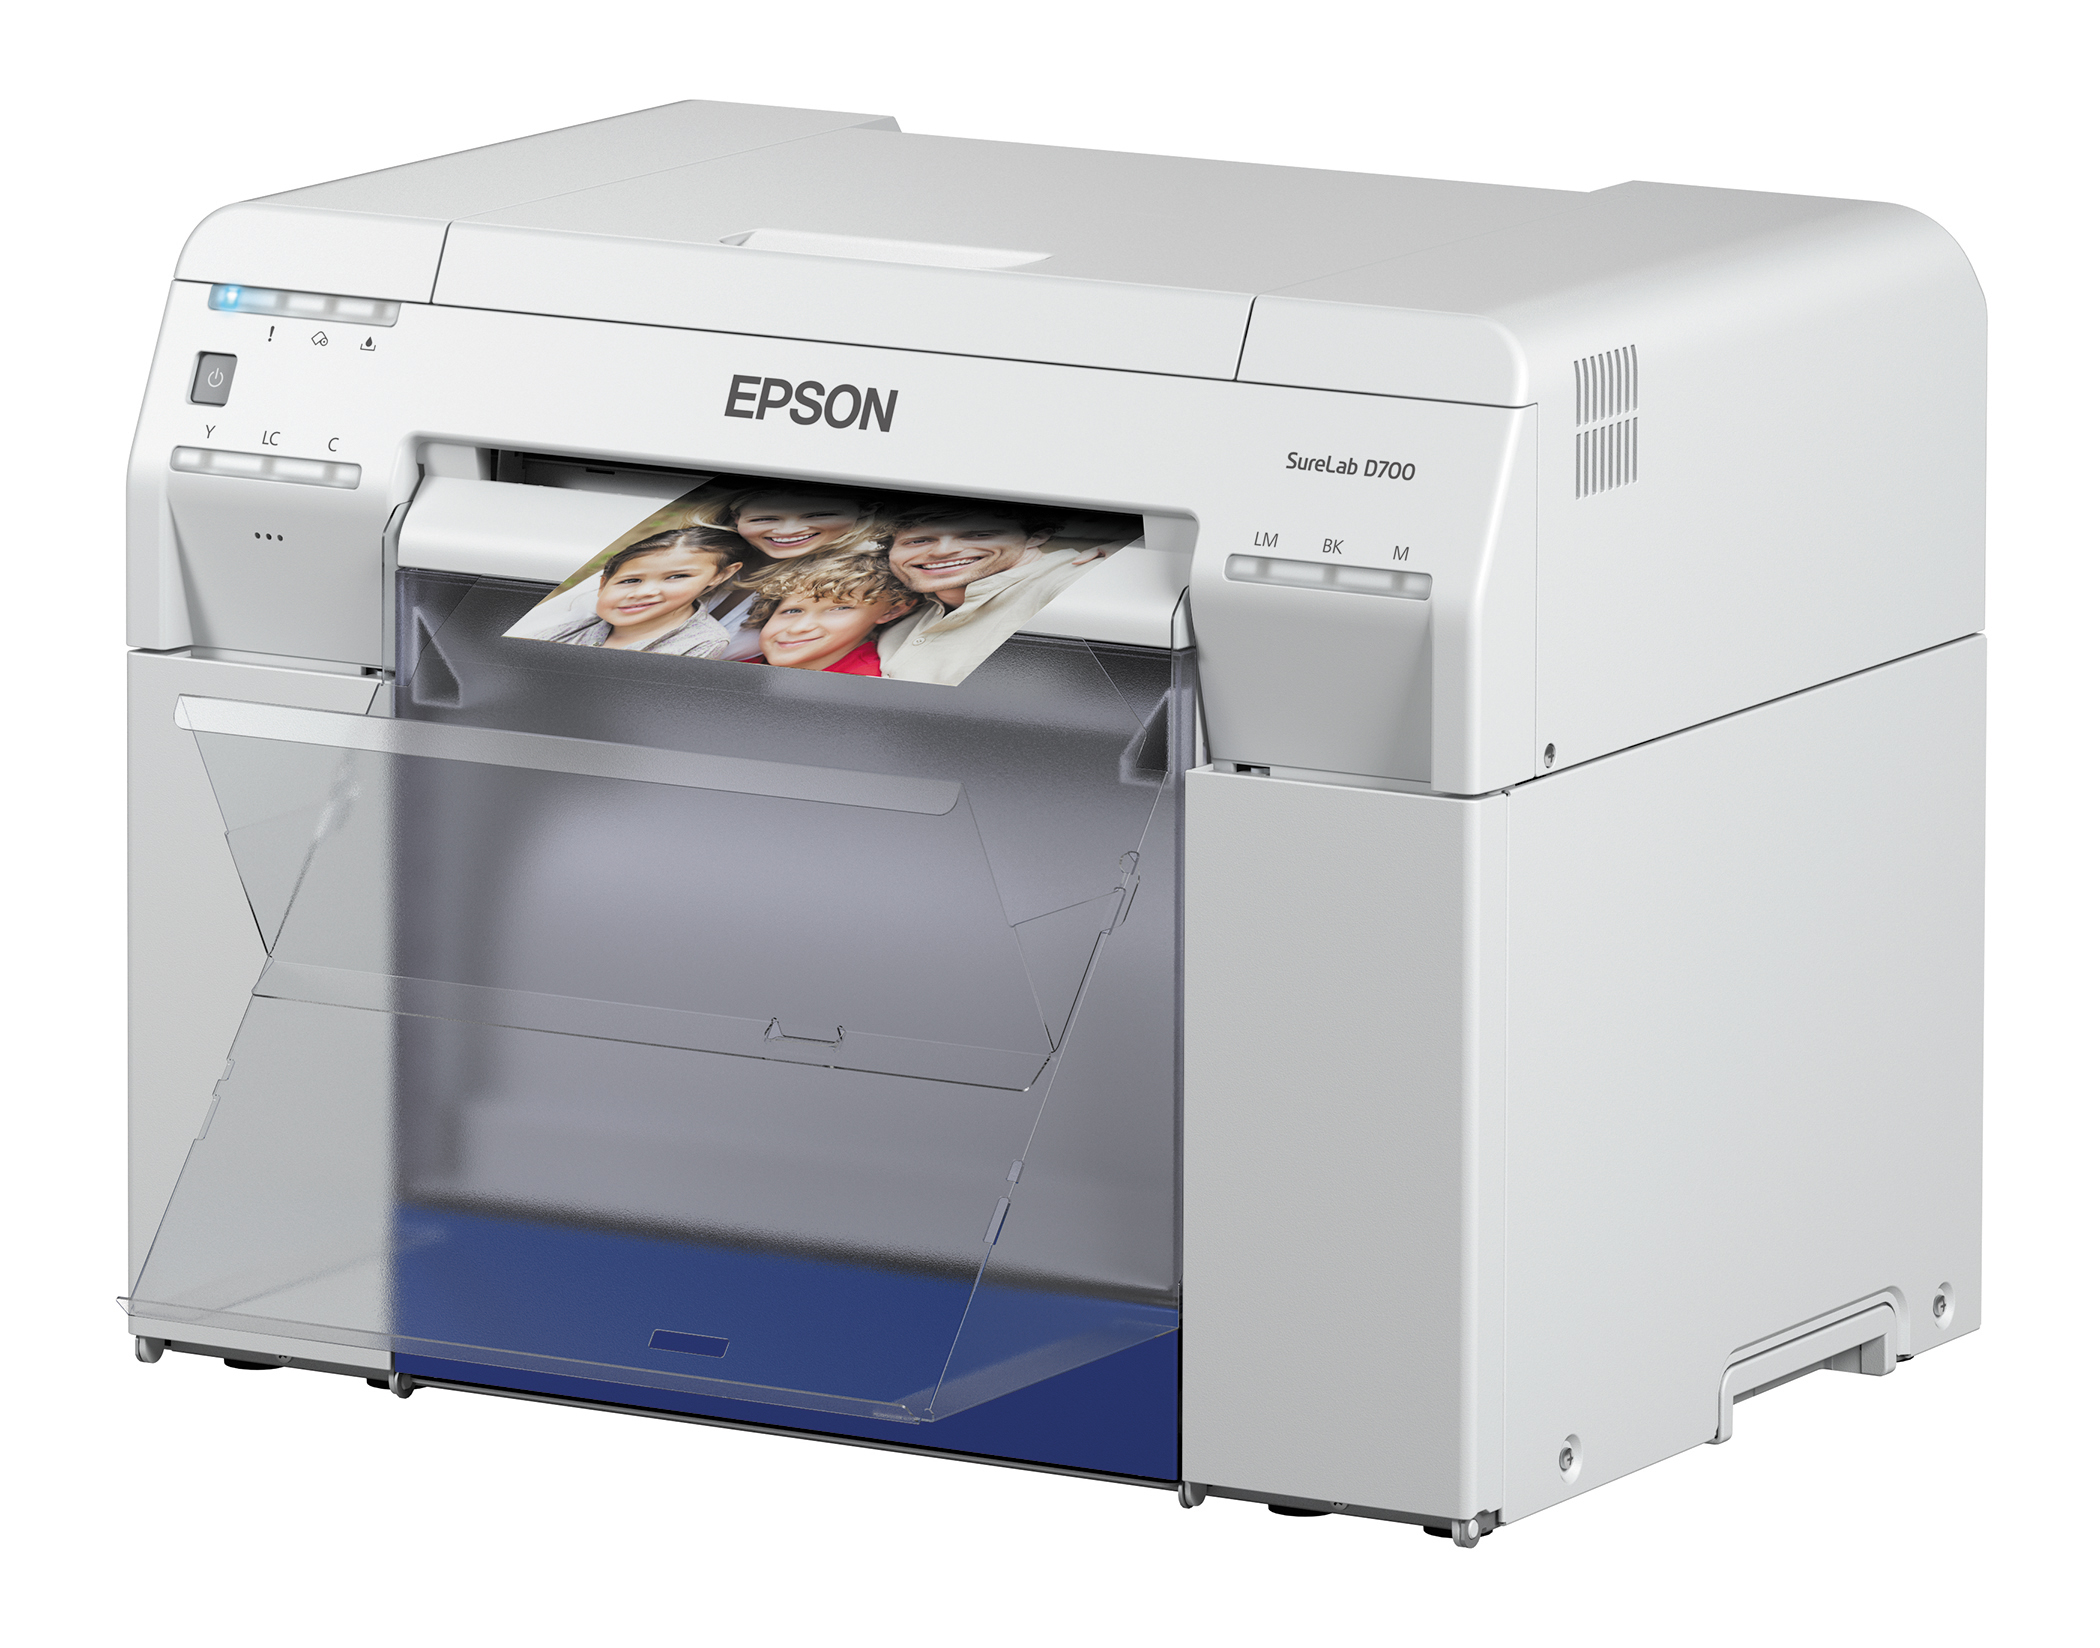 Epson SureLab D700 Standard Edition (SLD700SE)